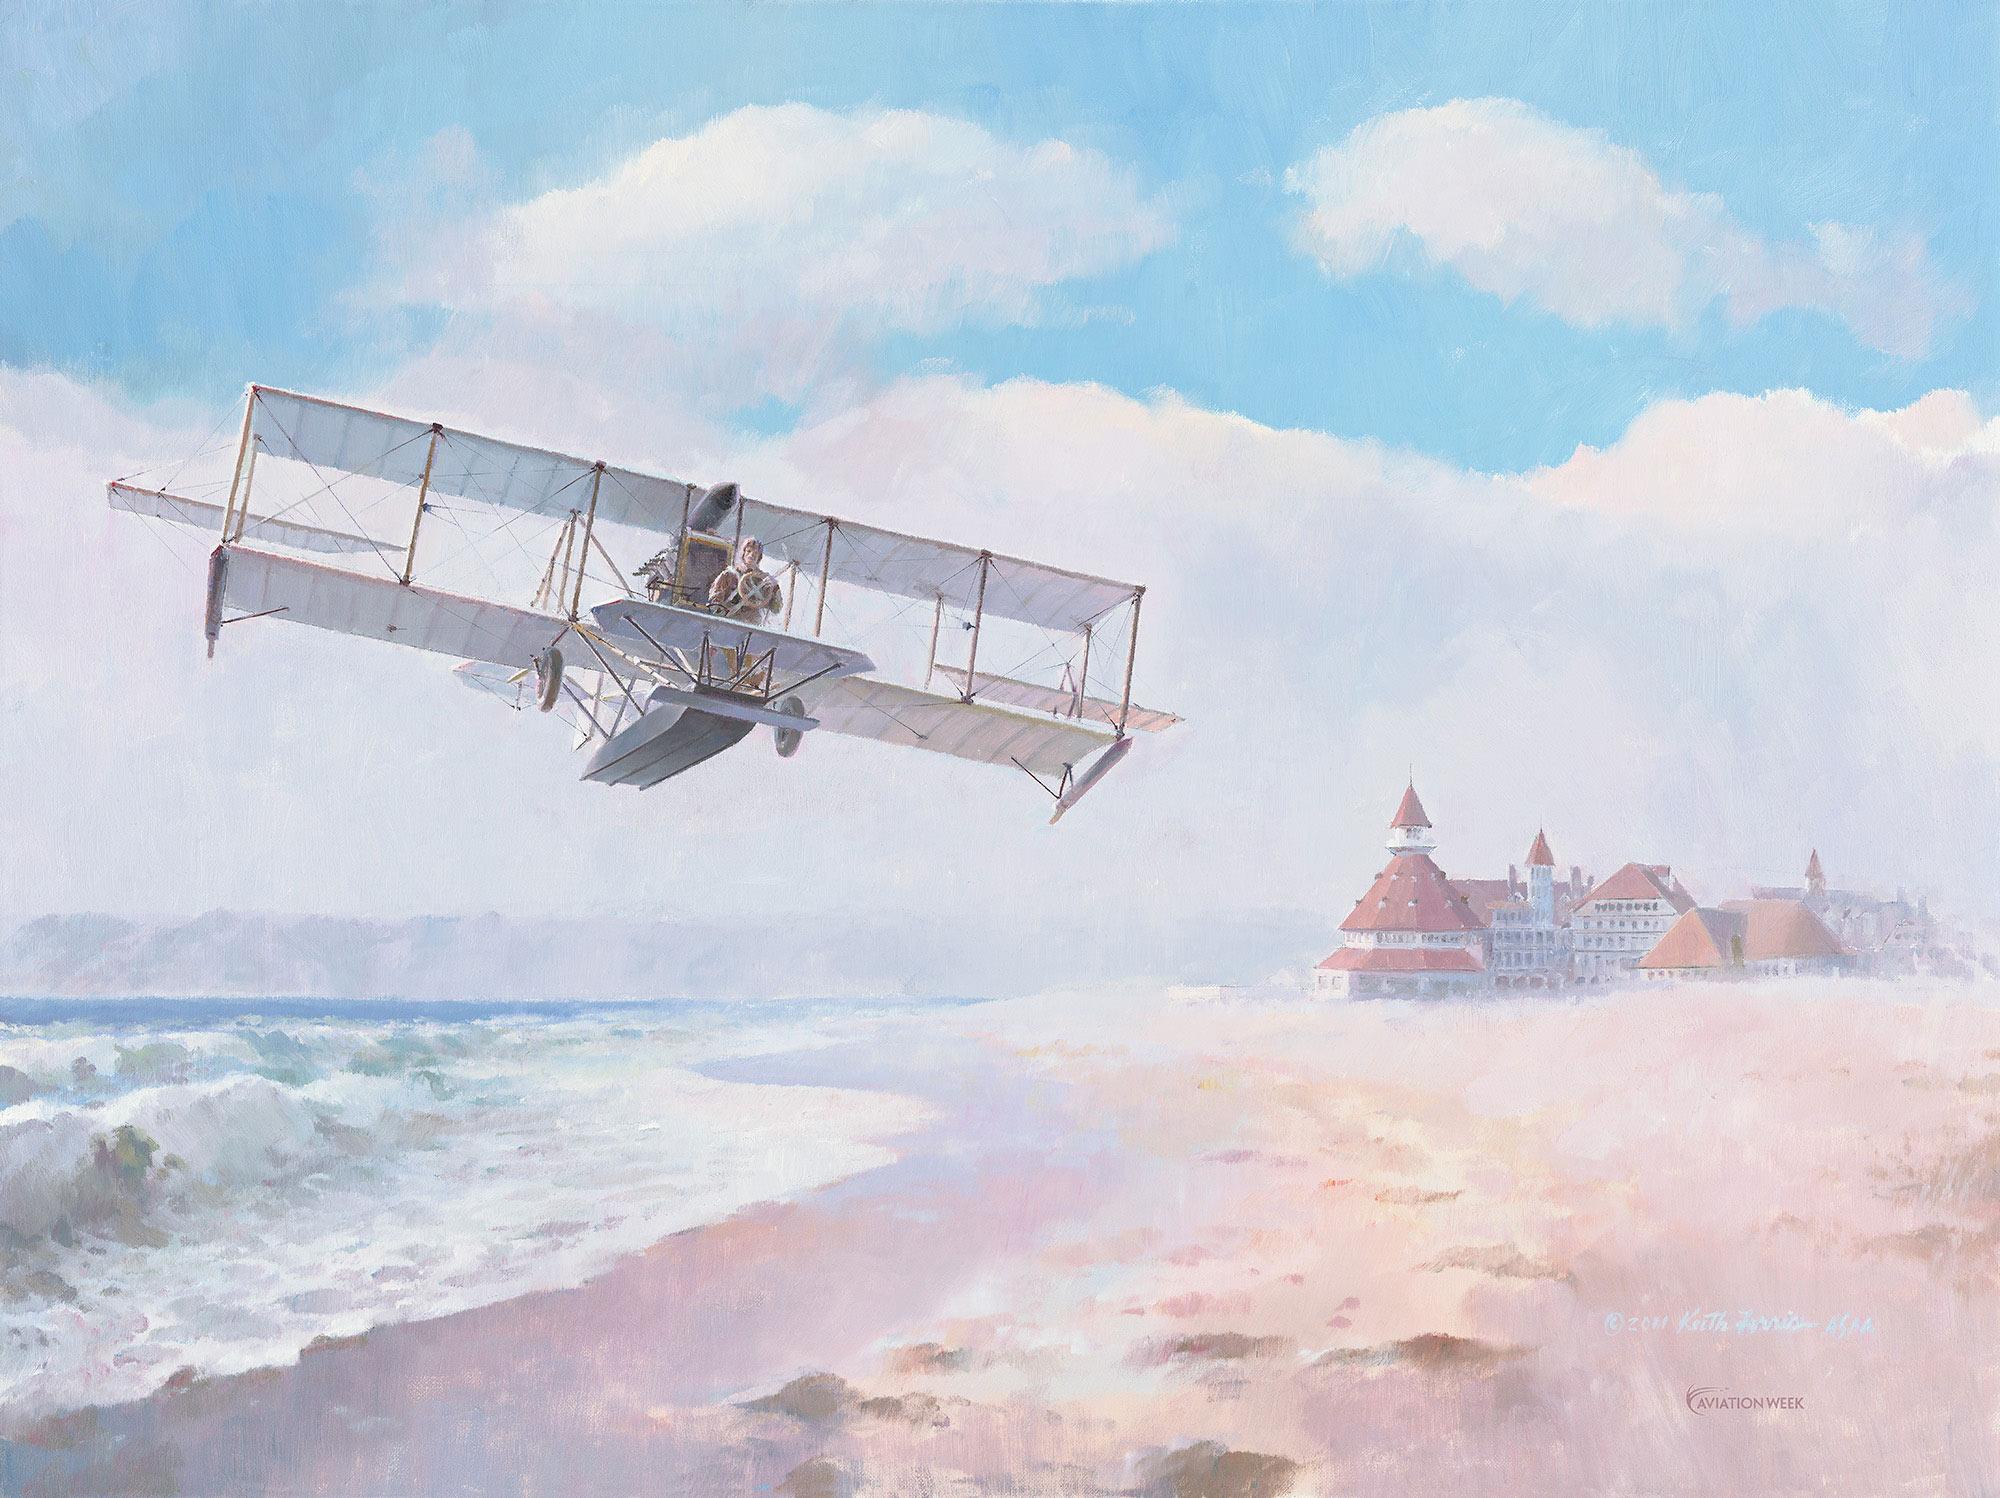 Navair Rising, Curtiss A-1 First Seaplane, Naval AVIATOR #1 Spuds Ellyson, Hotel Del Coronado, San Diego, CA. Naval Aviation 100th Anniversary, A-1 Giclee Print